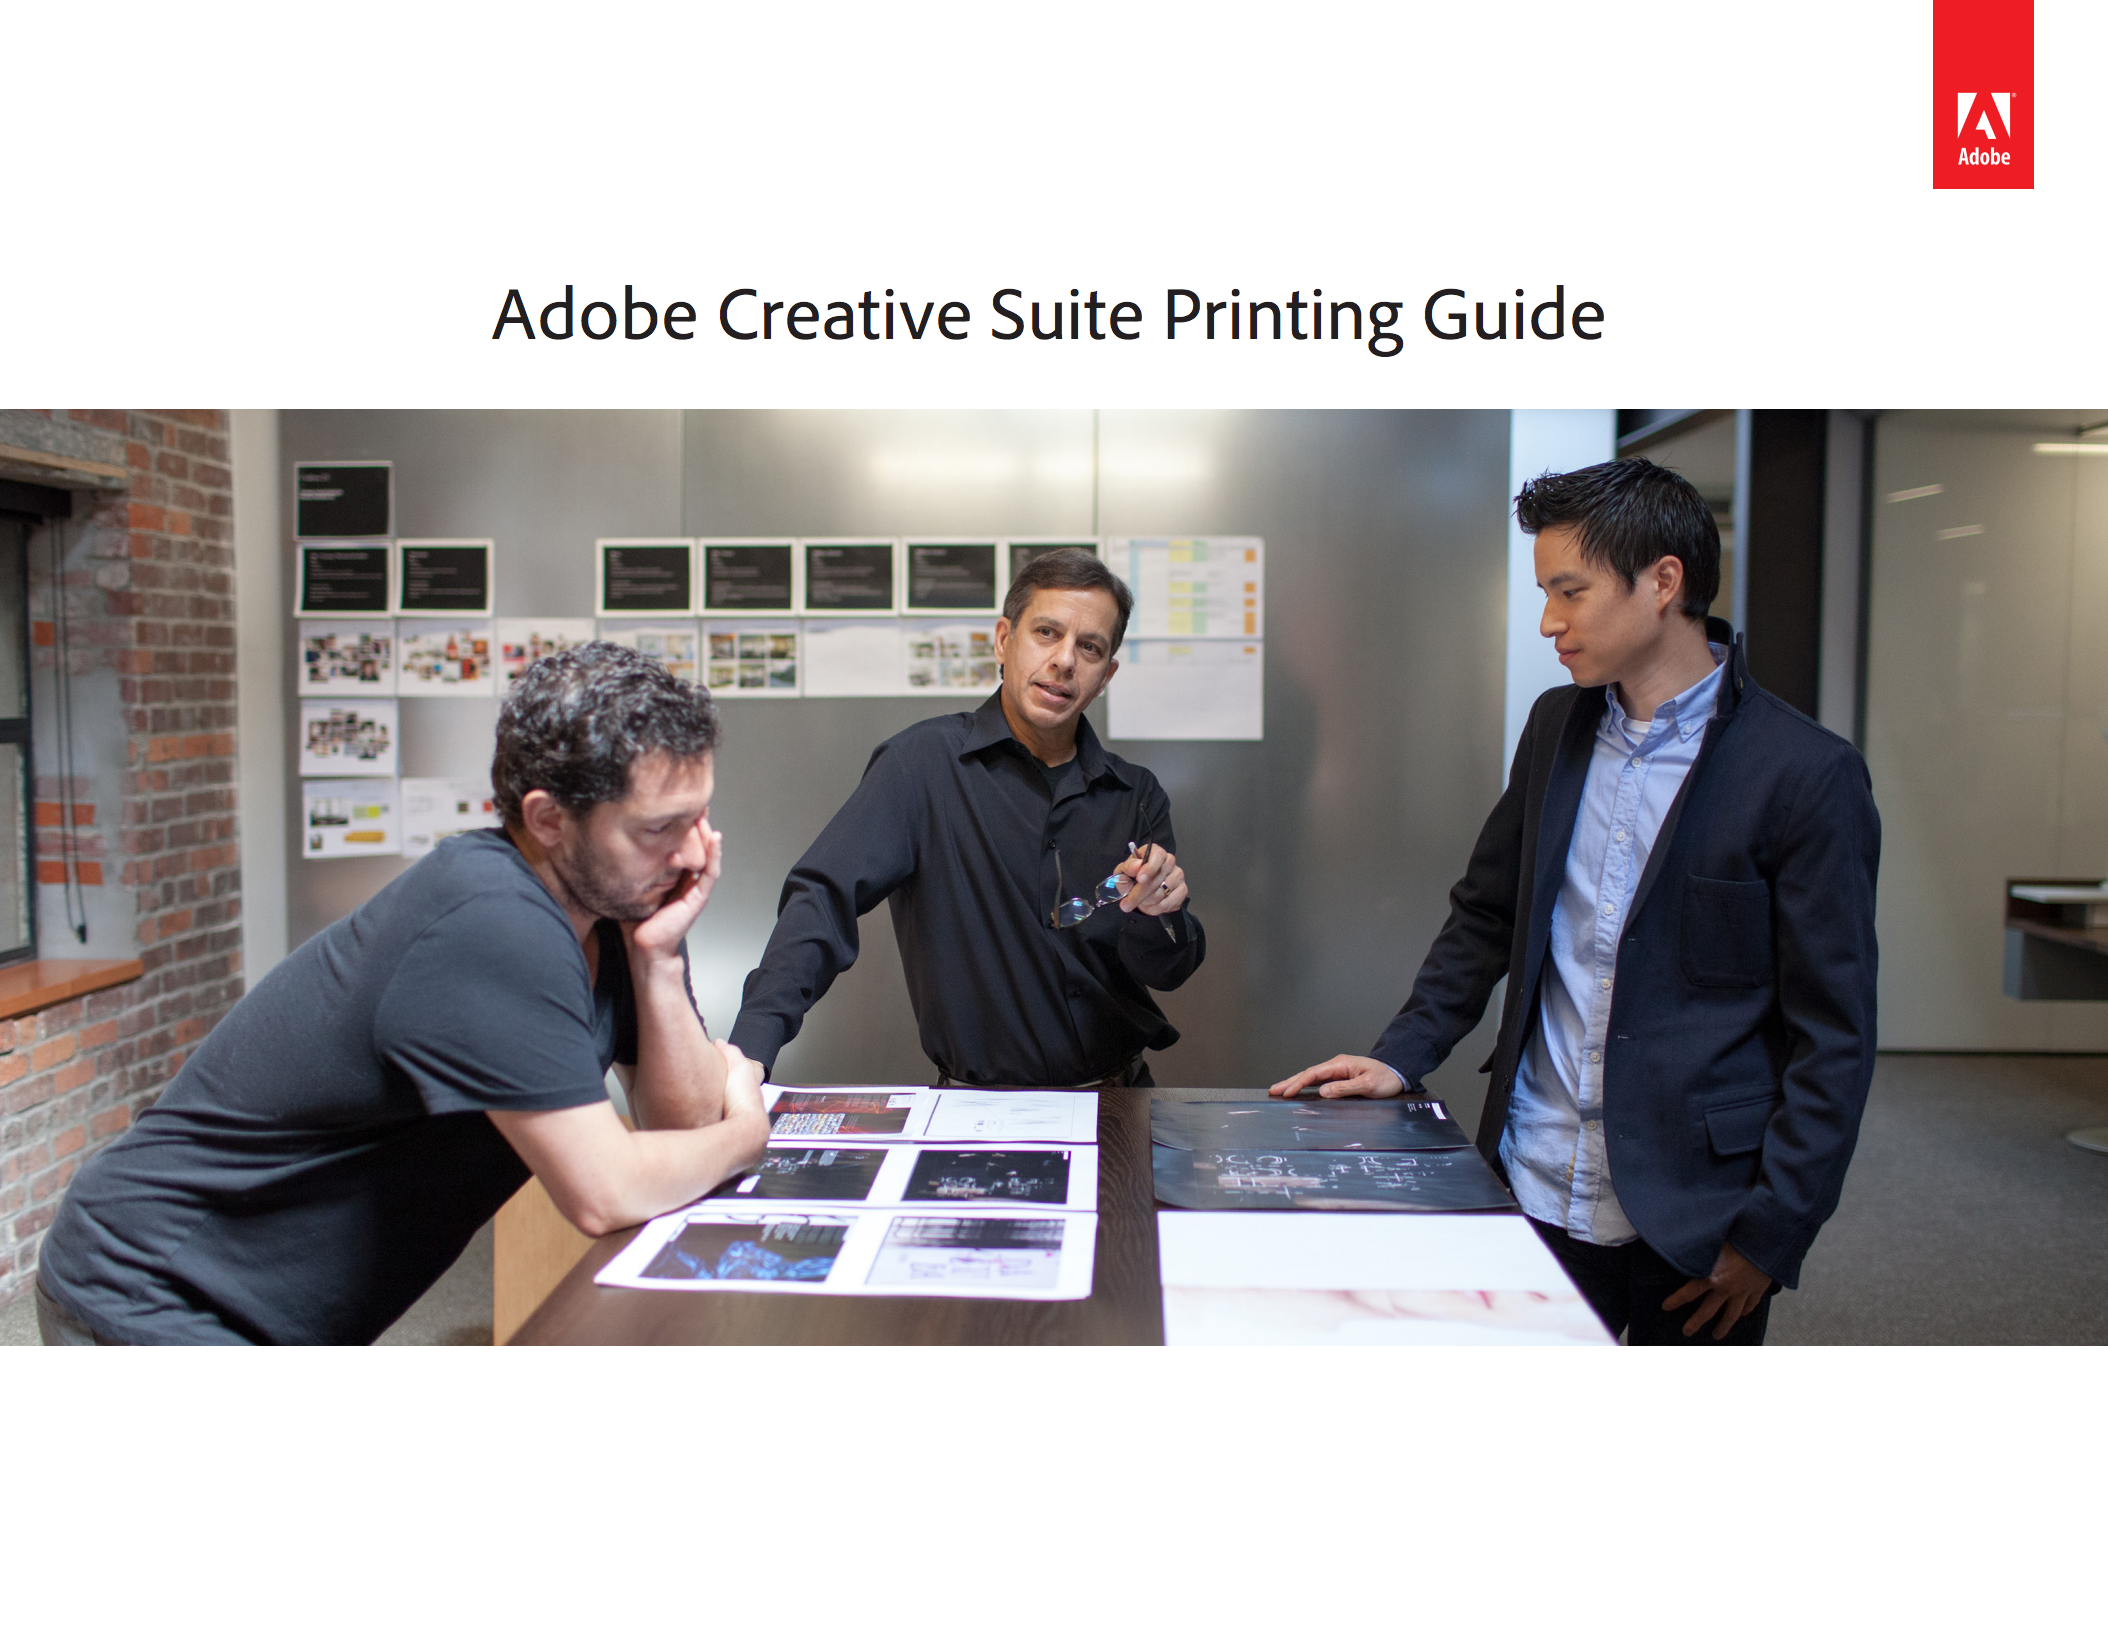 Adobe Printing Guide — Adobe